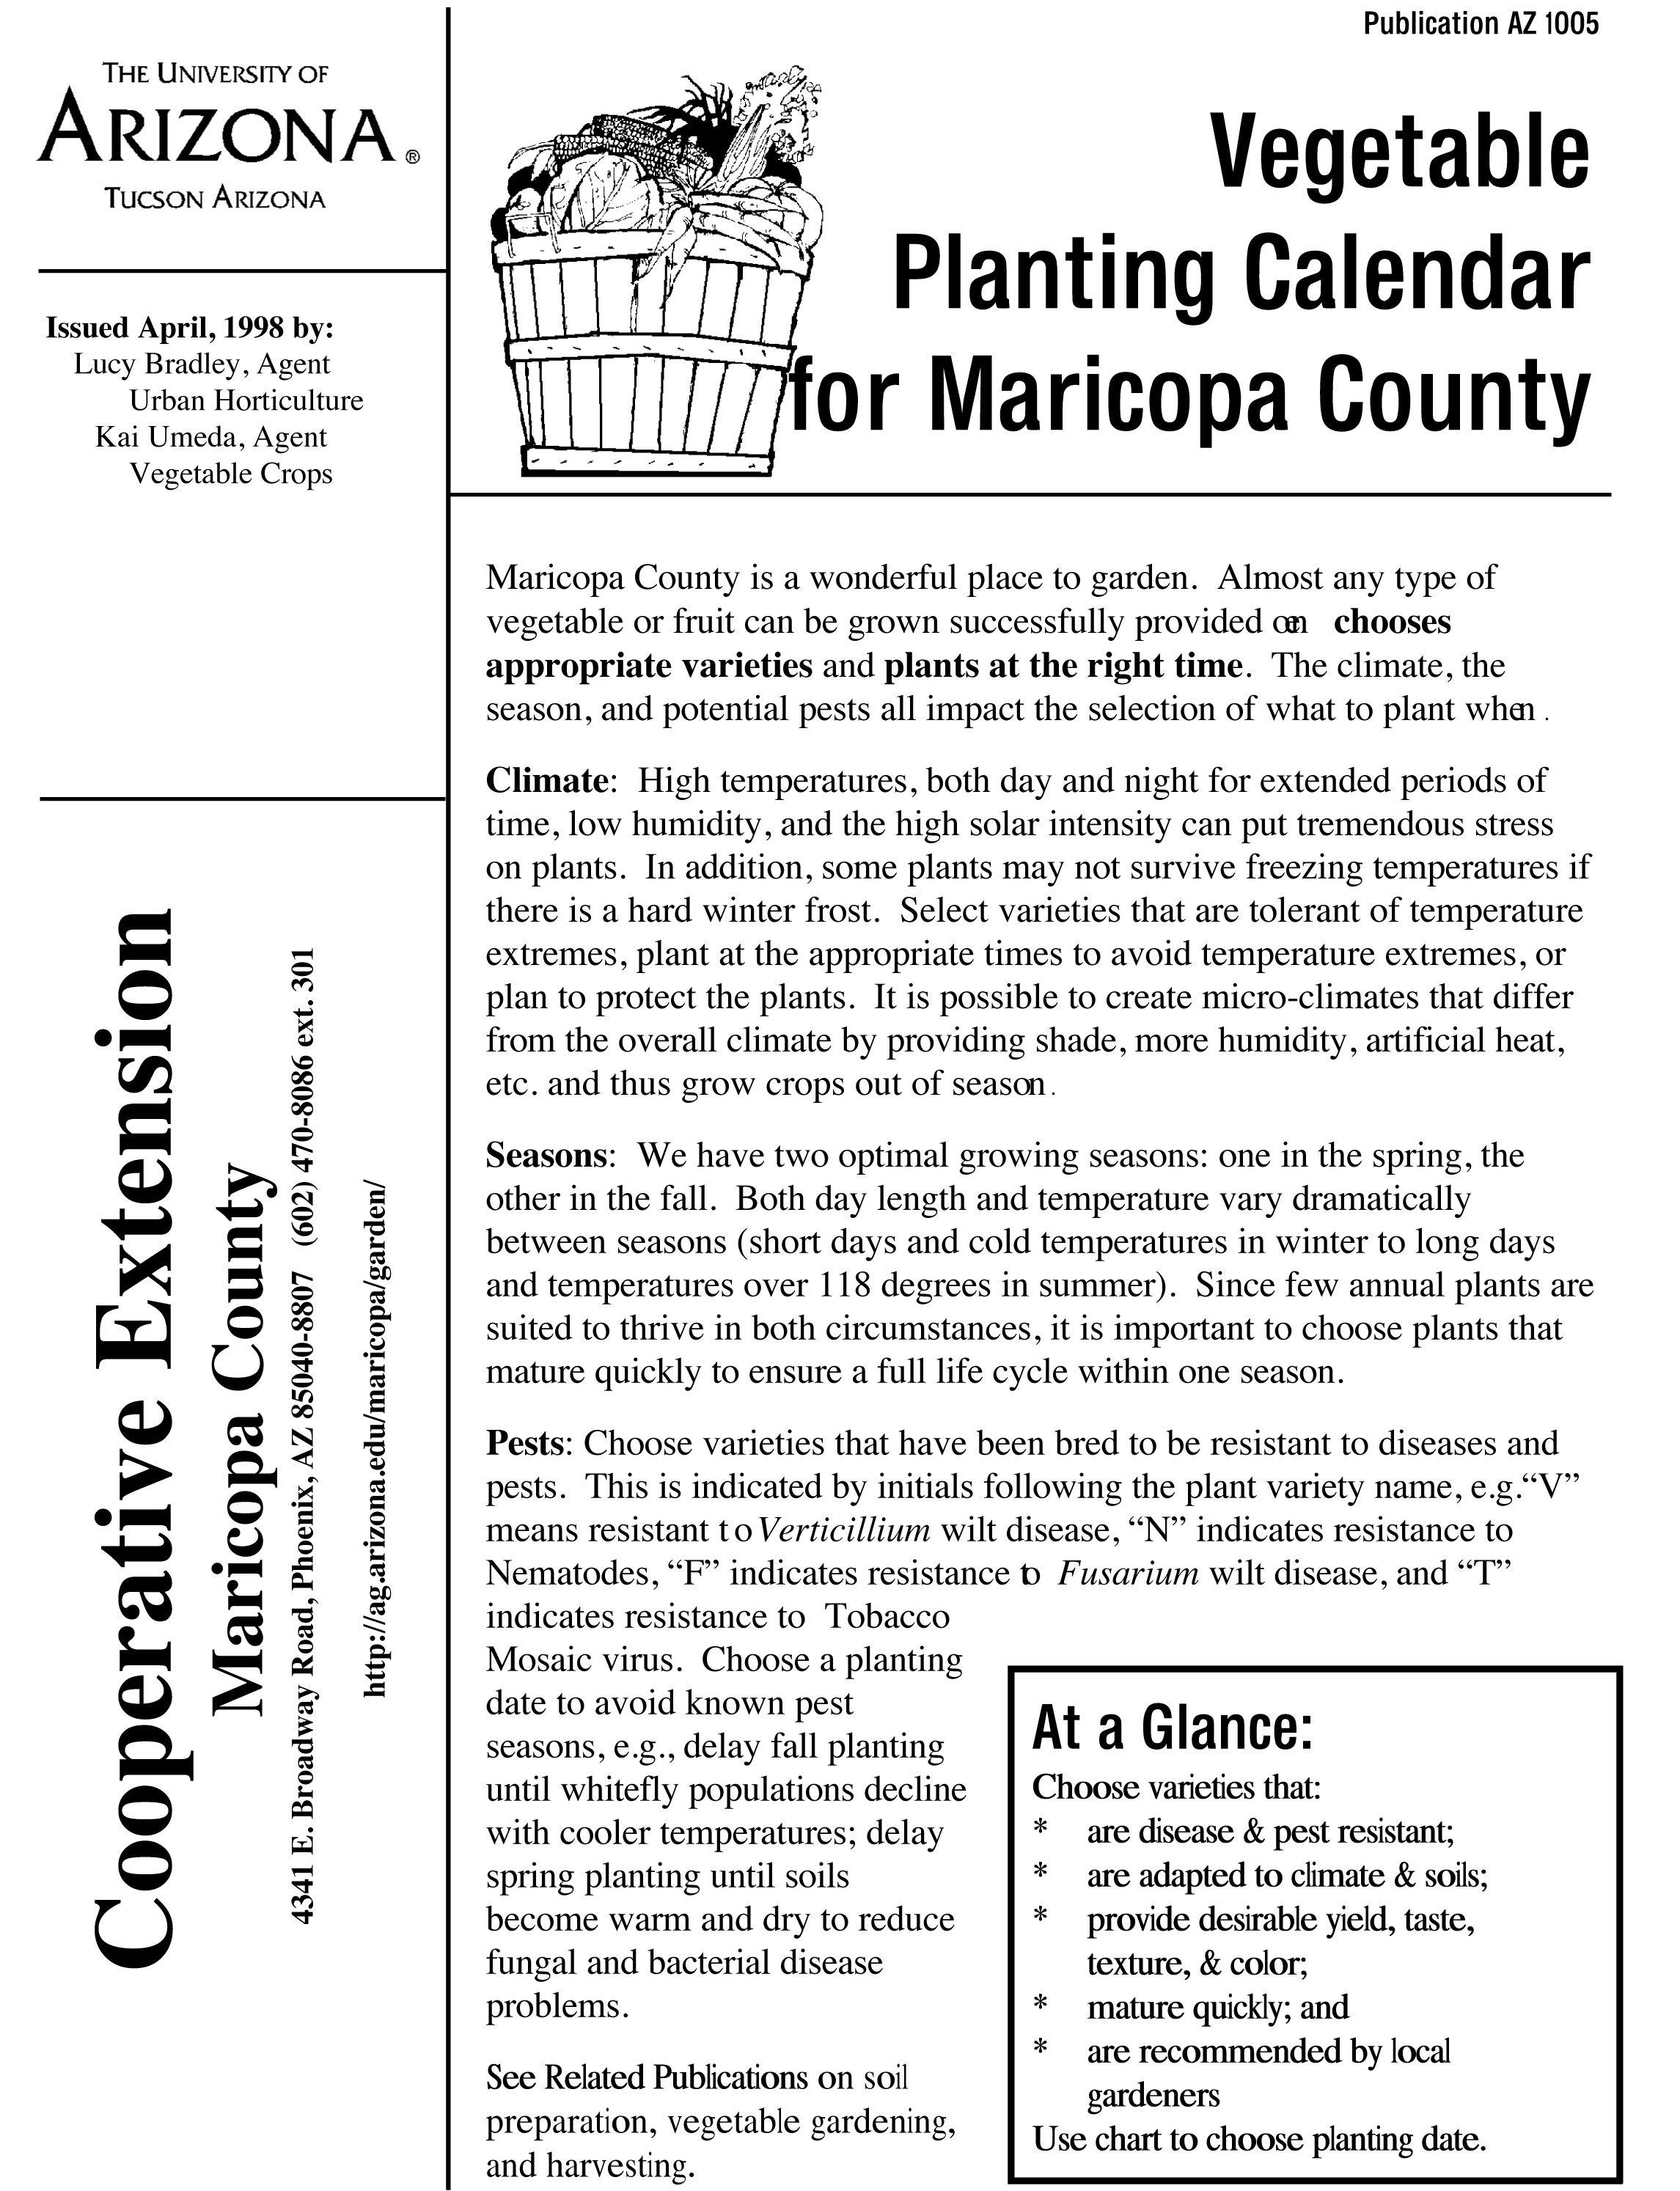 Vegetable Planting Calendar of Maricopa County, Arizona Planting  Vegetables, Vegetable Planting Calendar, Gardening